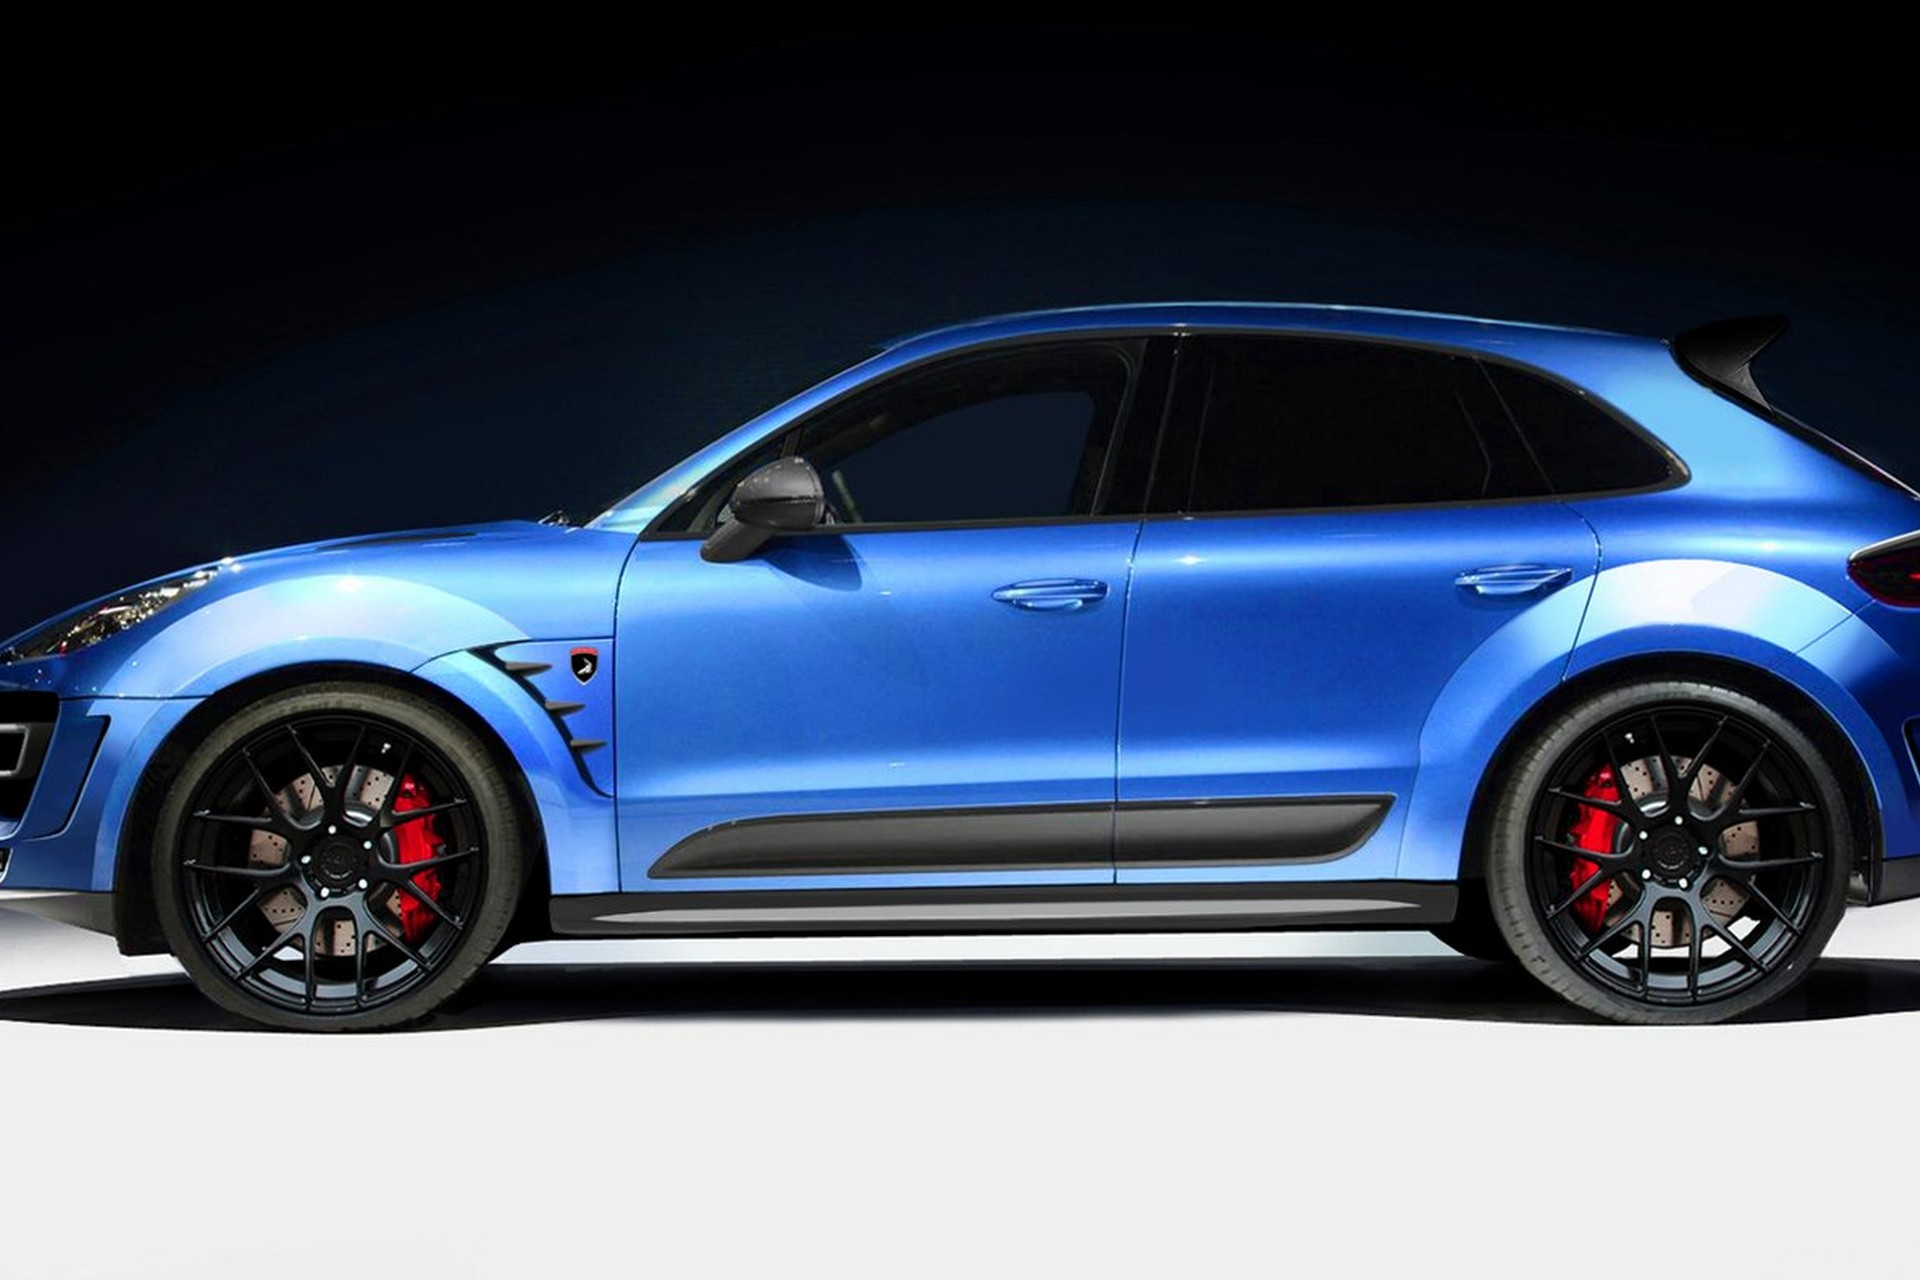 Tuning Porsche Macan Turbo Ursa Topcar